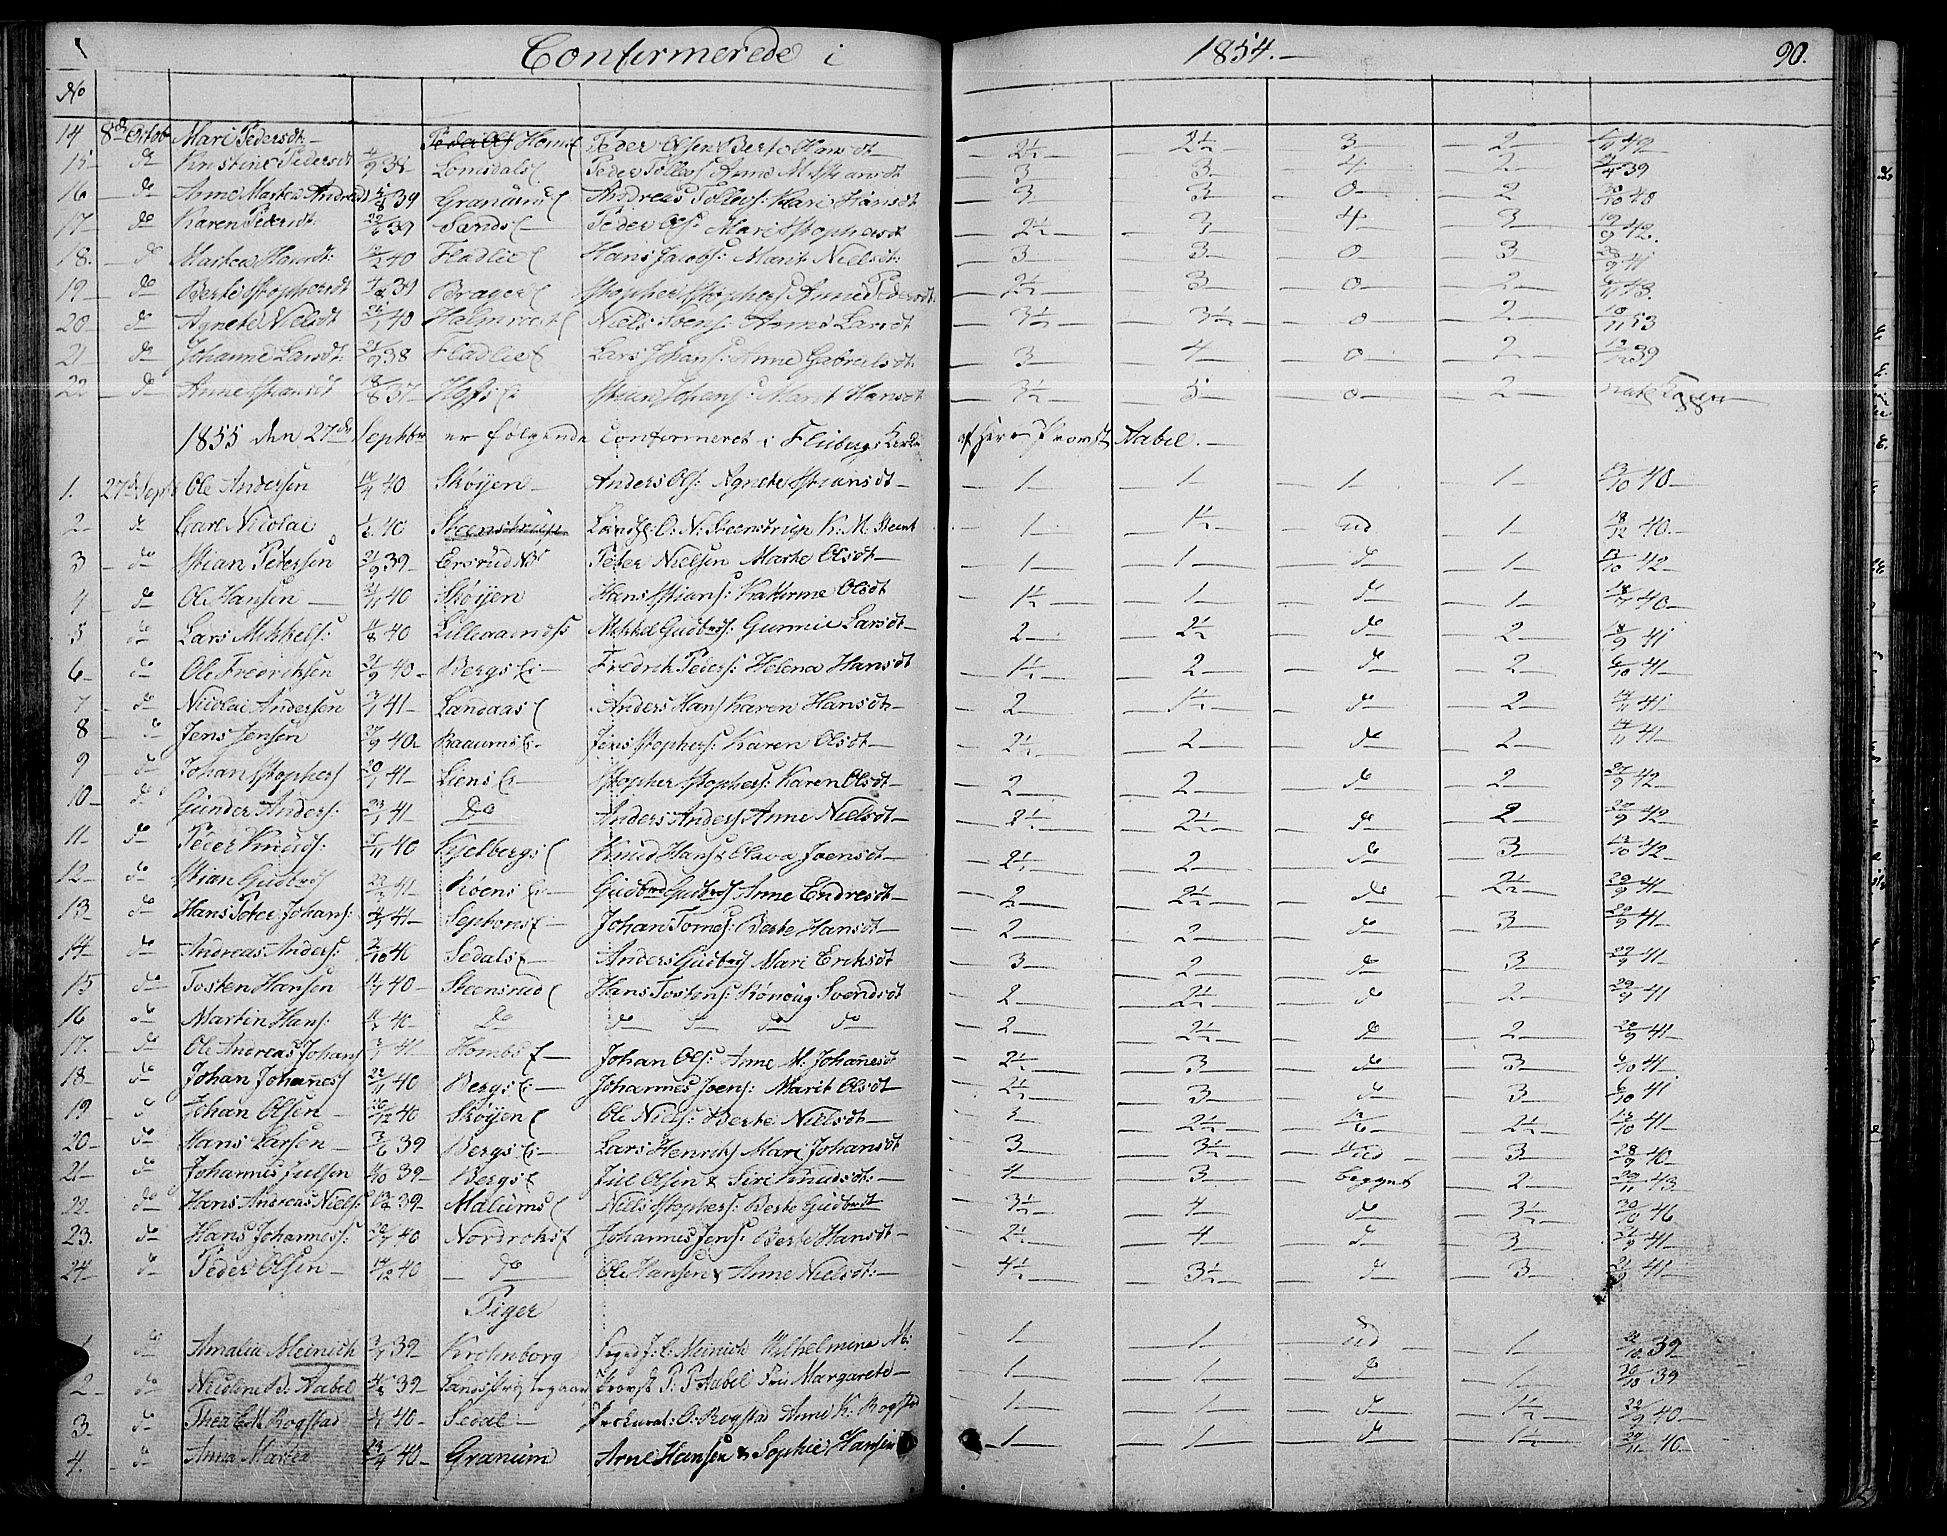 SAH, Søndre Land prestekontor, L/L0001: Klokkerbok nr. 1, 1849-1883, s. 90